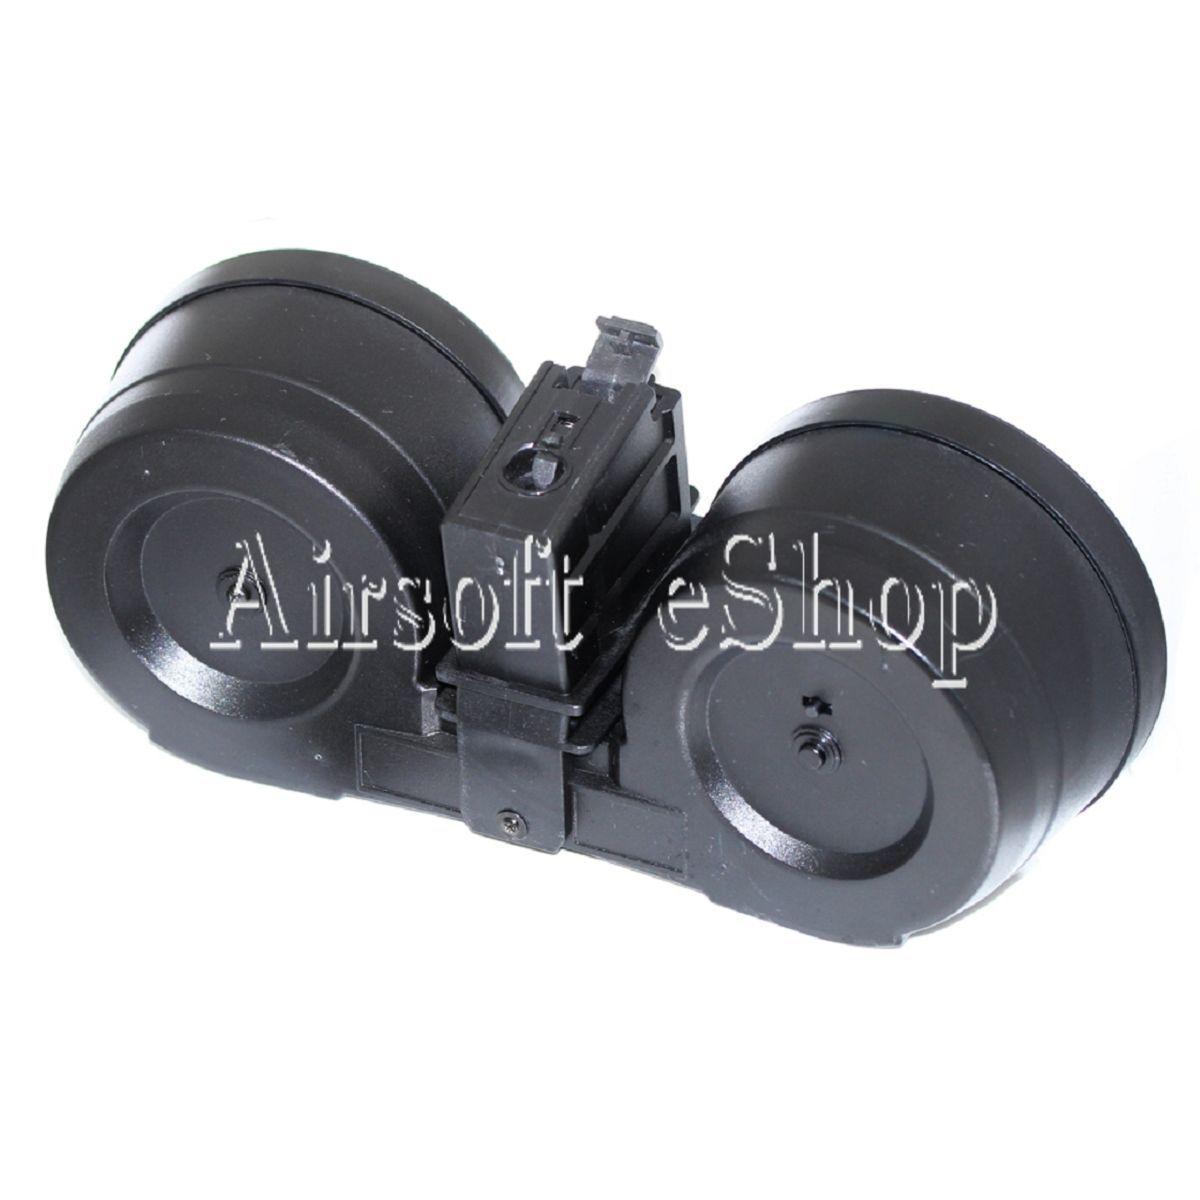 Revista De Tambor Battleaxe 2500rd Airsoft eléctrico  C-Mag Para G36 AEG Negro  Compra calidad 100% autentica